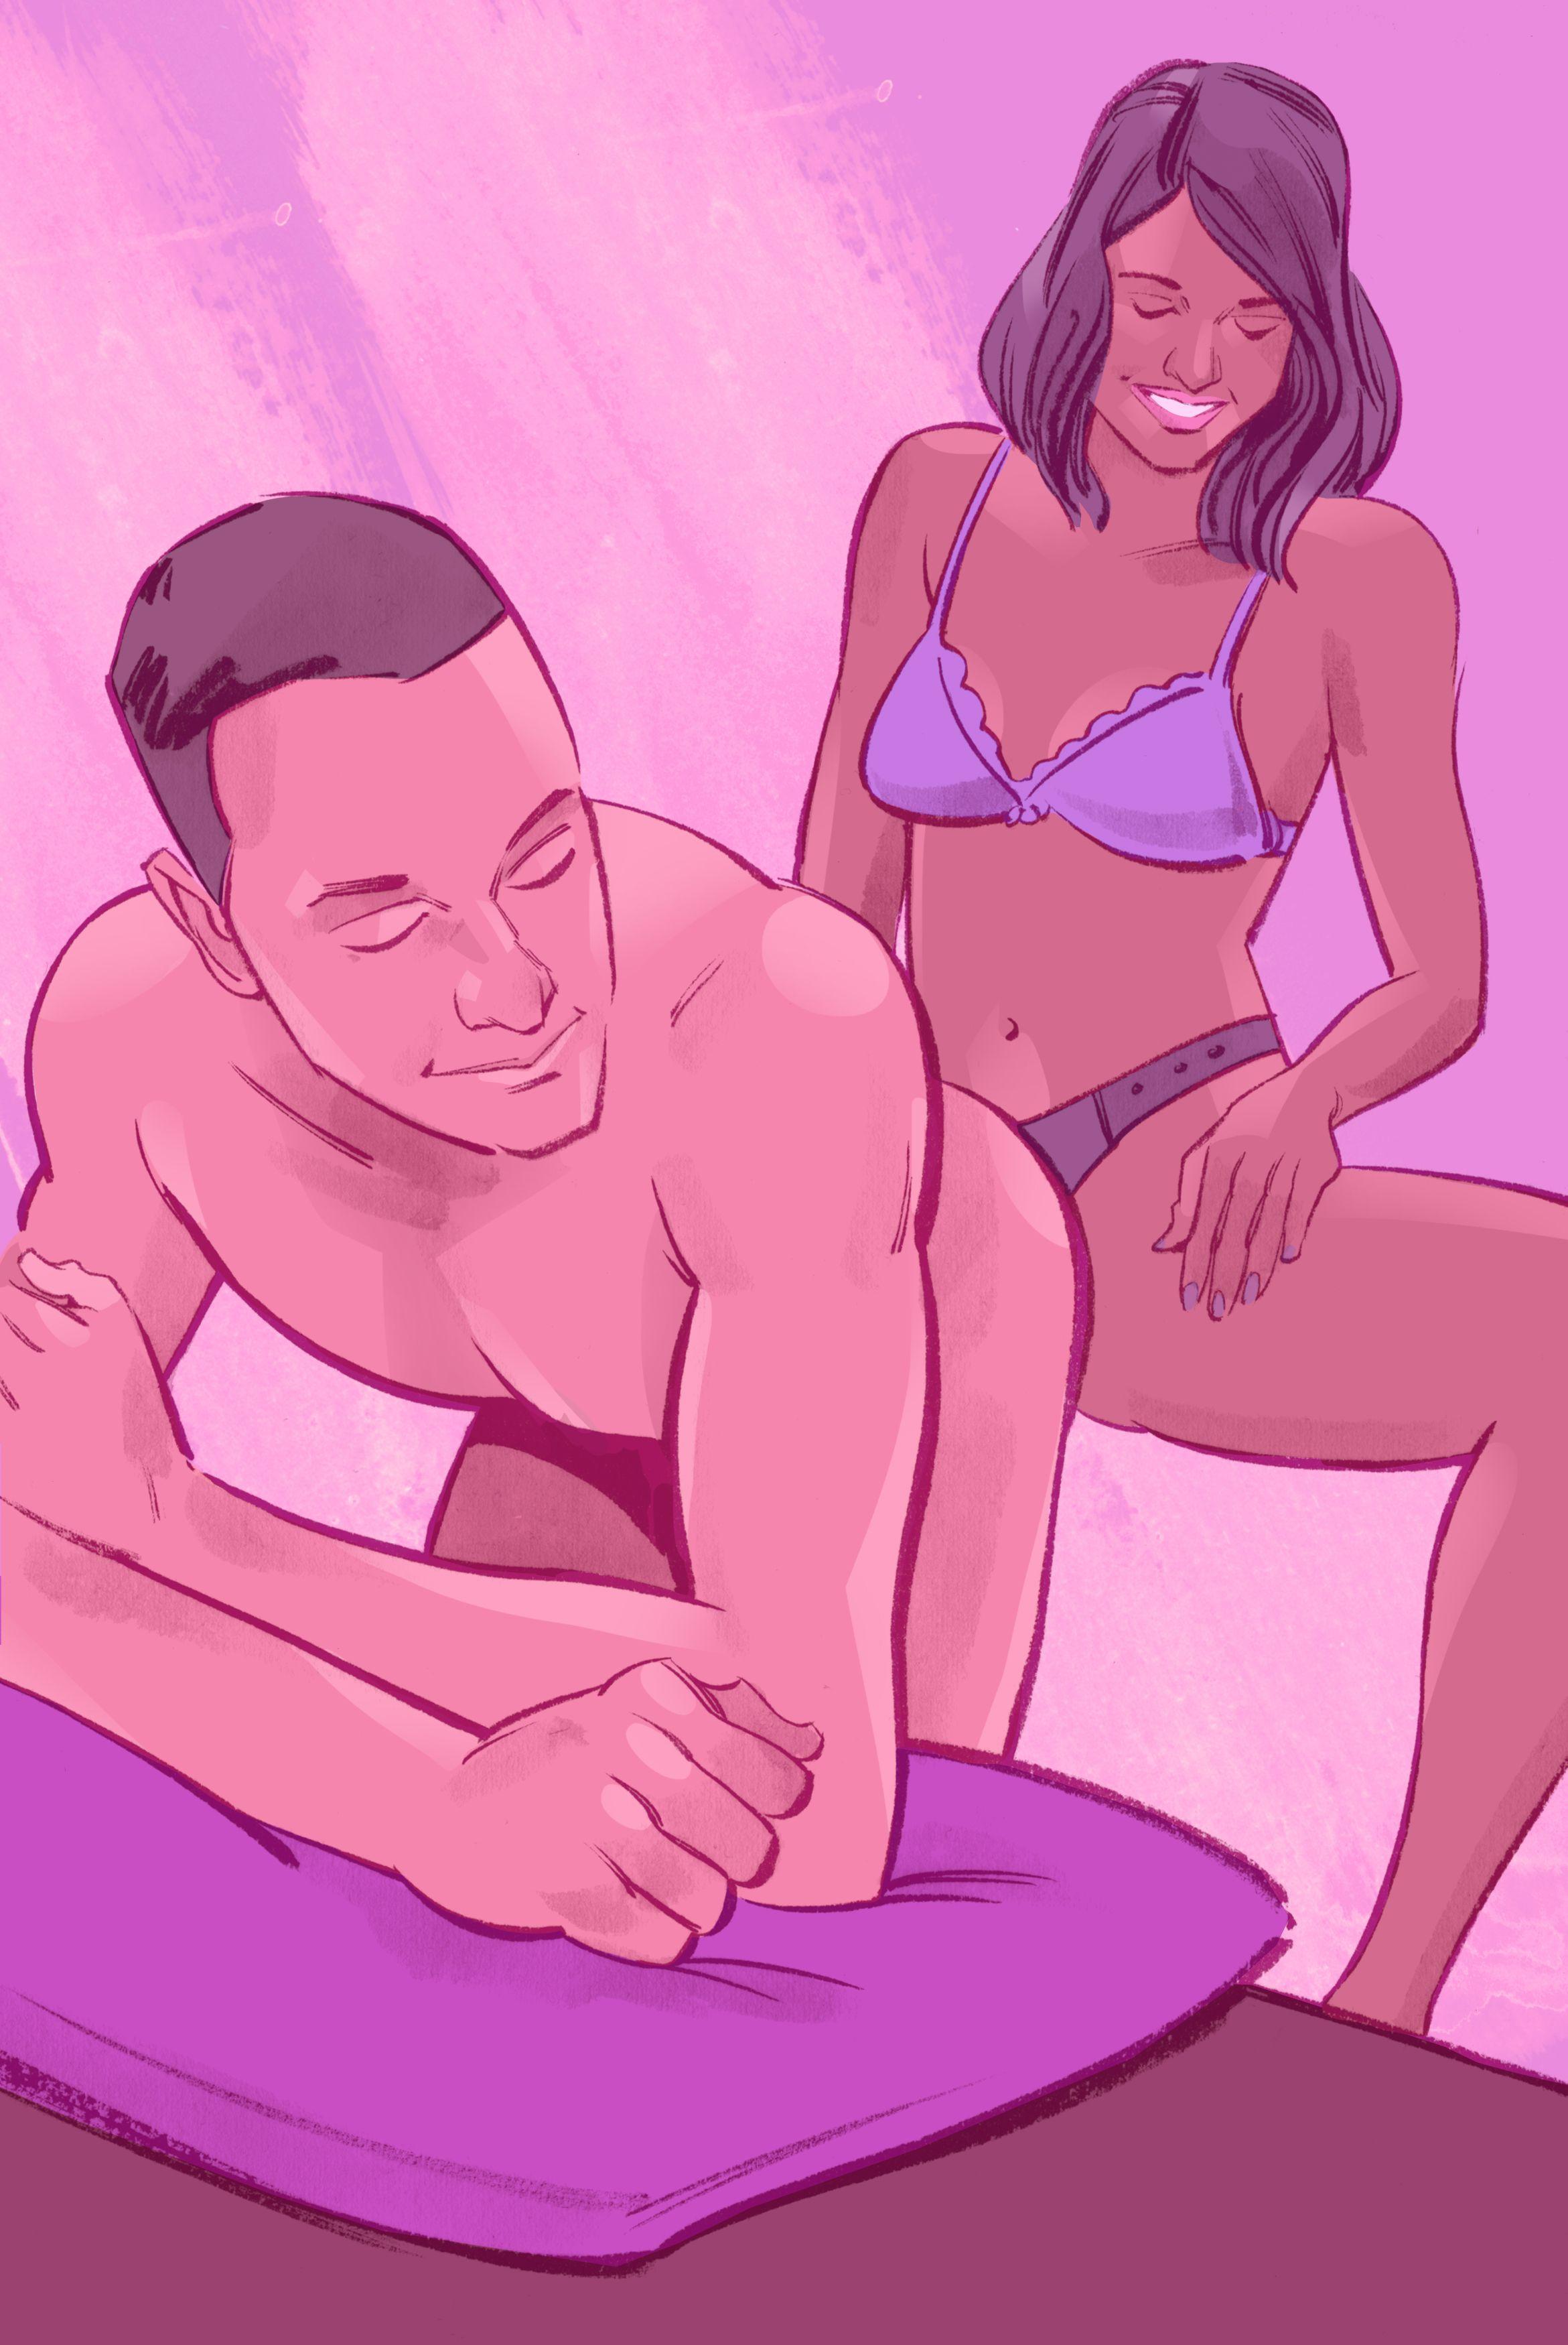 پوزین پگینگ - نقطه جی در مردان یا نقطه پی